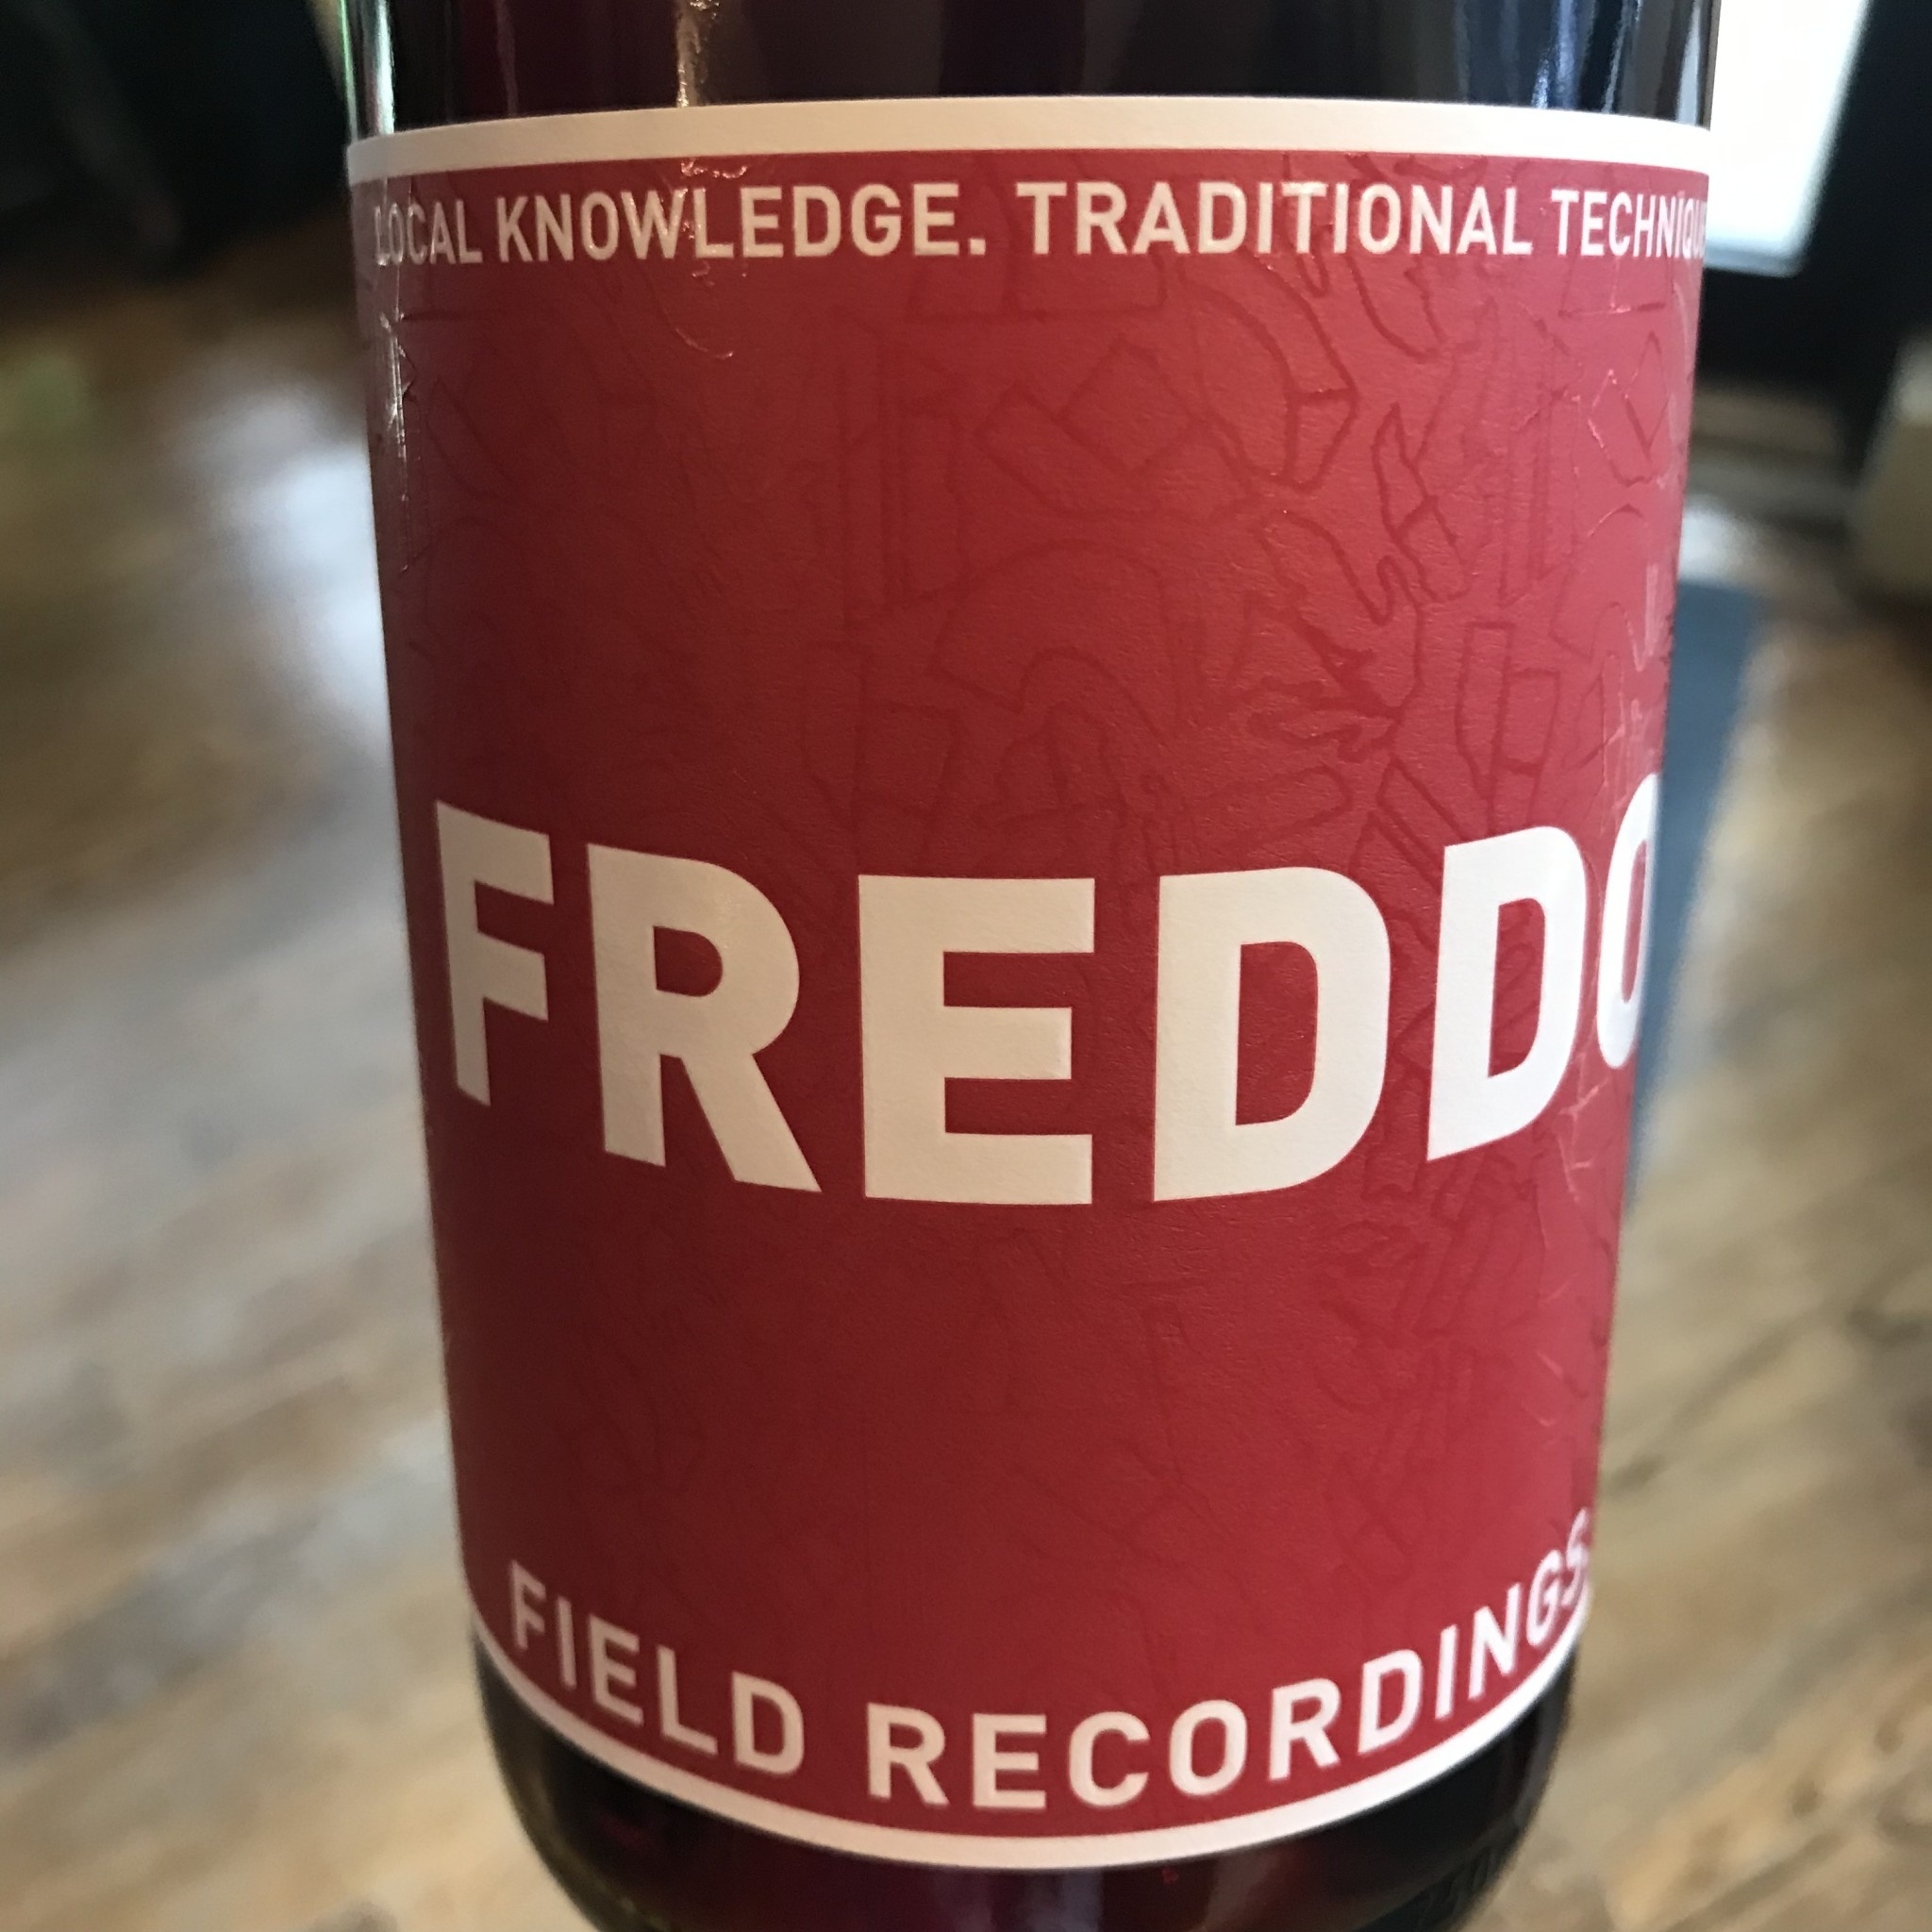 USA 2019 Field Recordings Freddo Sangiovese